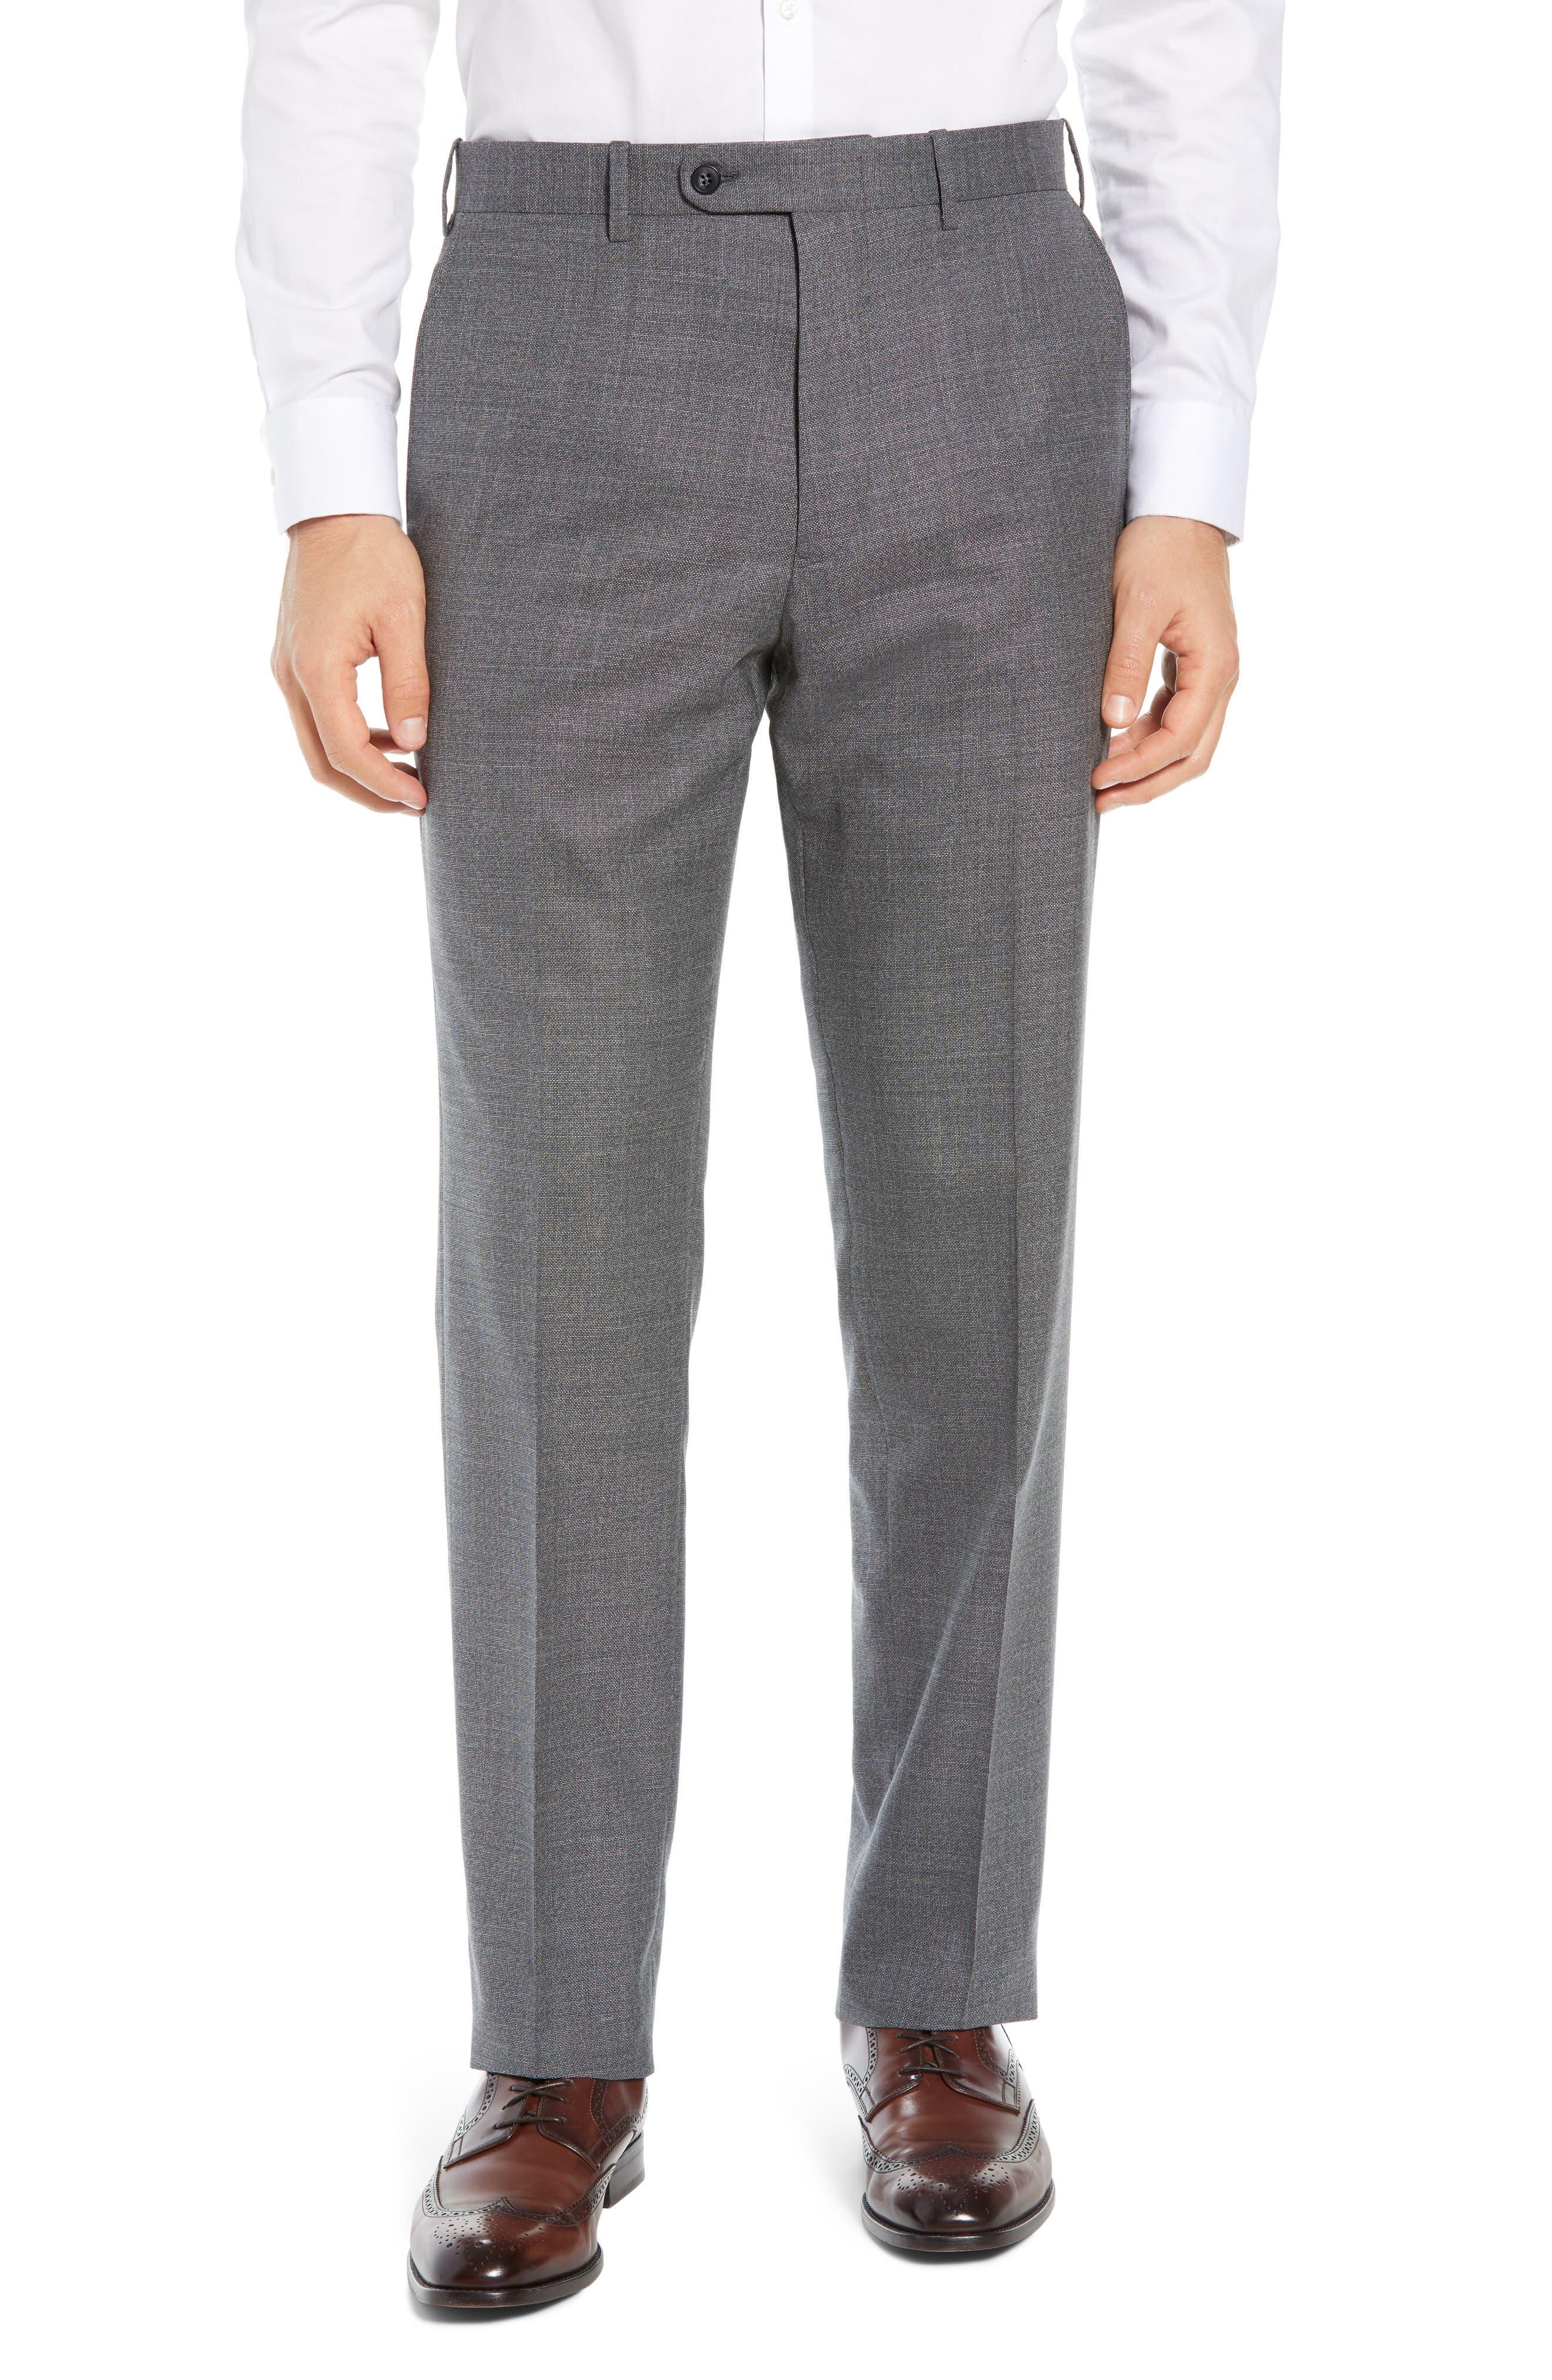 JOHN W. NORDSTROM<SUP>®</SUP>, Torino Flat Front Solid Wool Trousers, Main thumbnail 1, color, GREY PHANTOM BASKET WEAVE